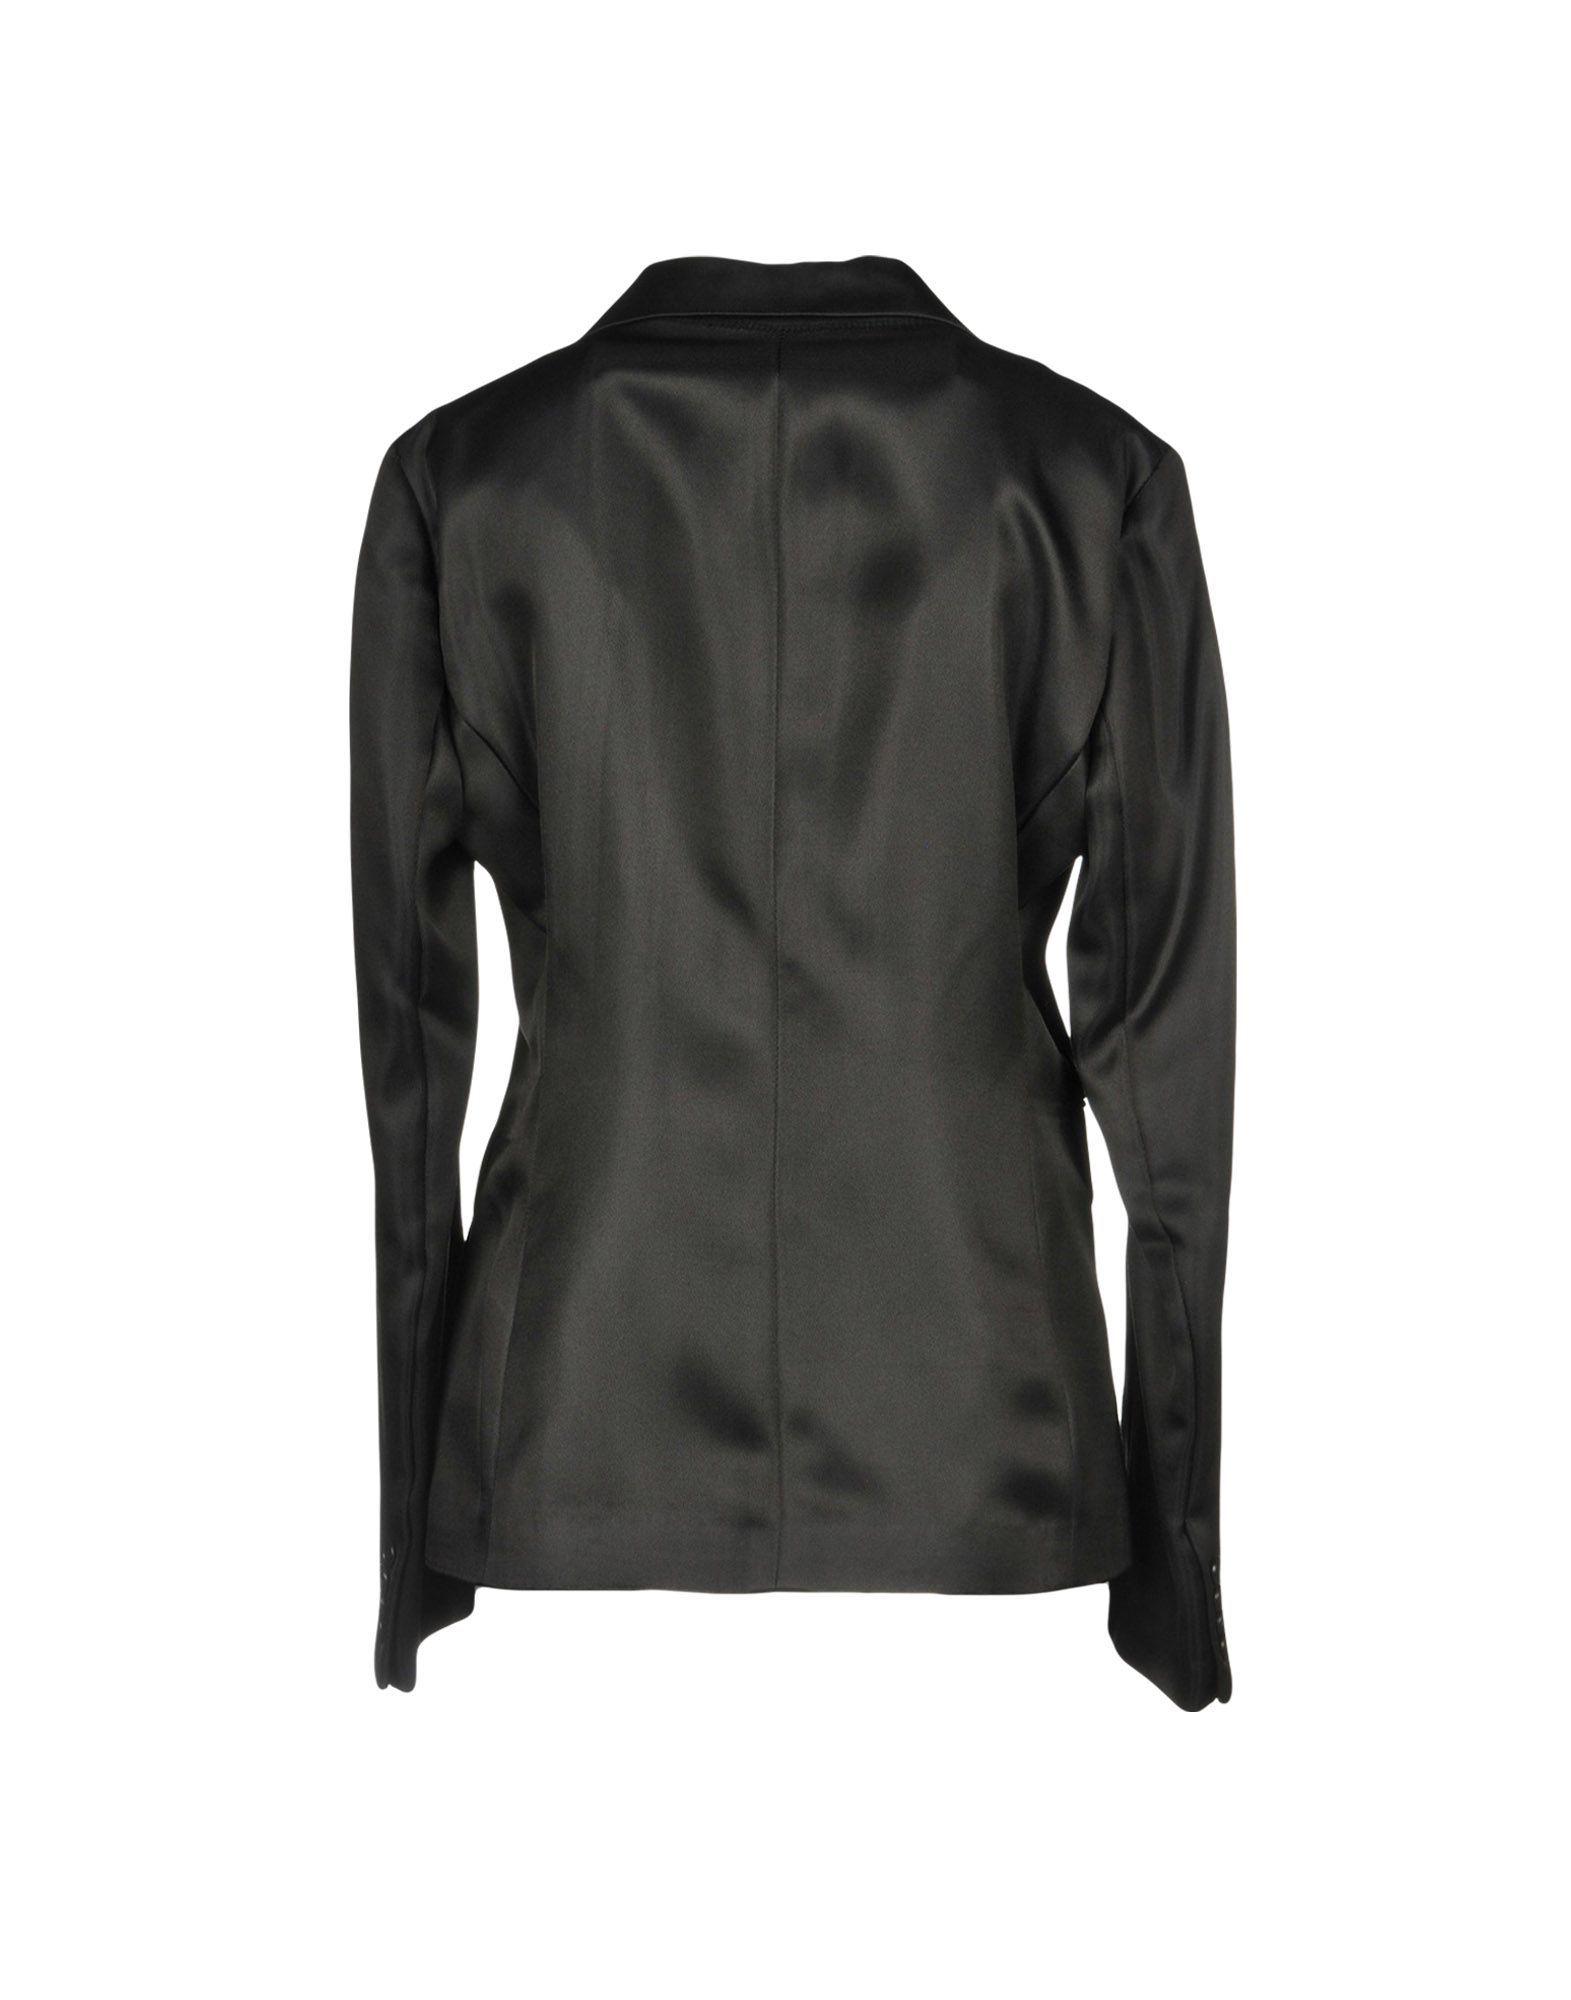 Aspesi Black Silk Weave Single Breasted Blazer